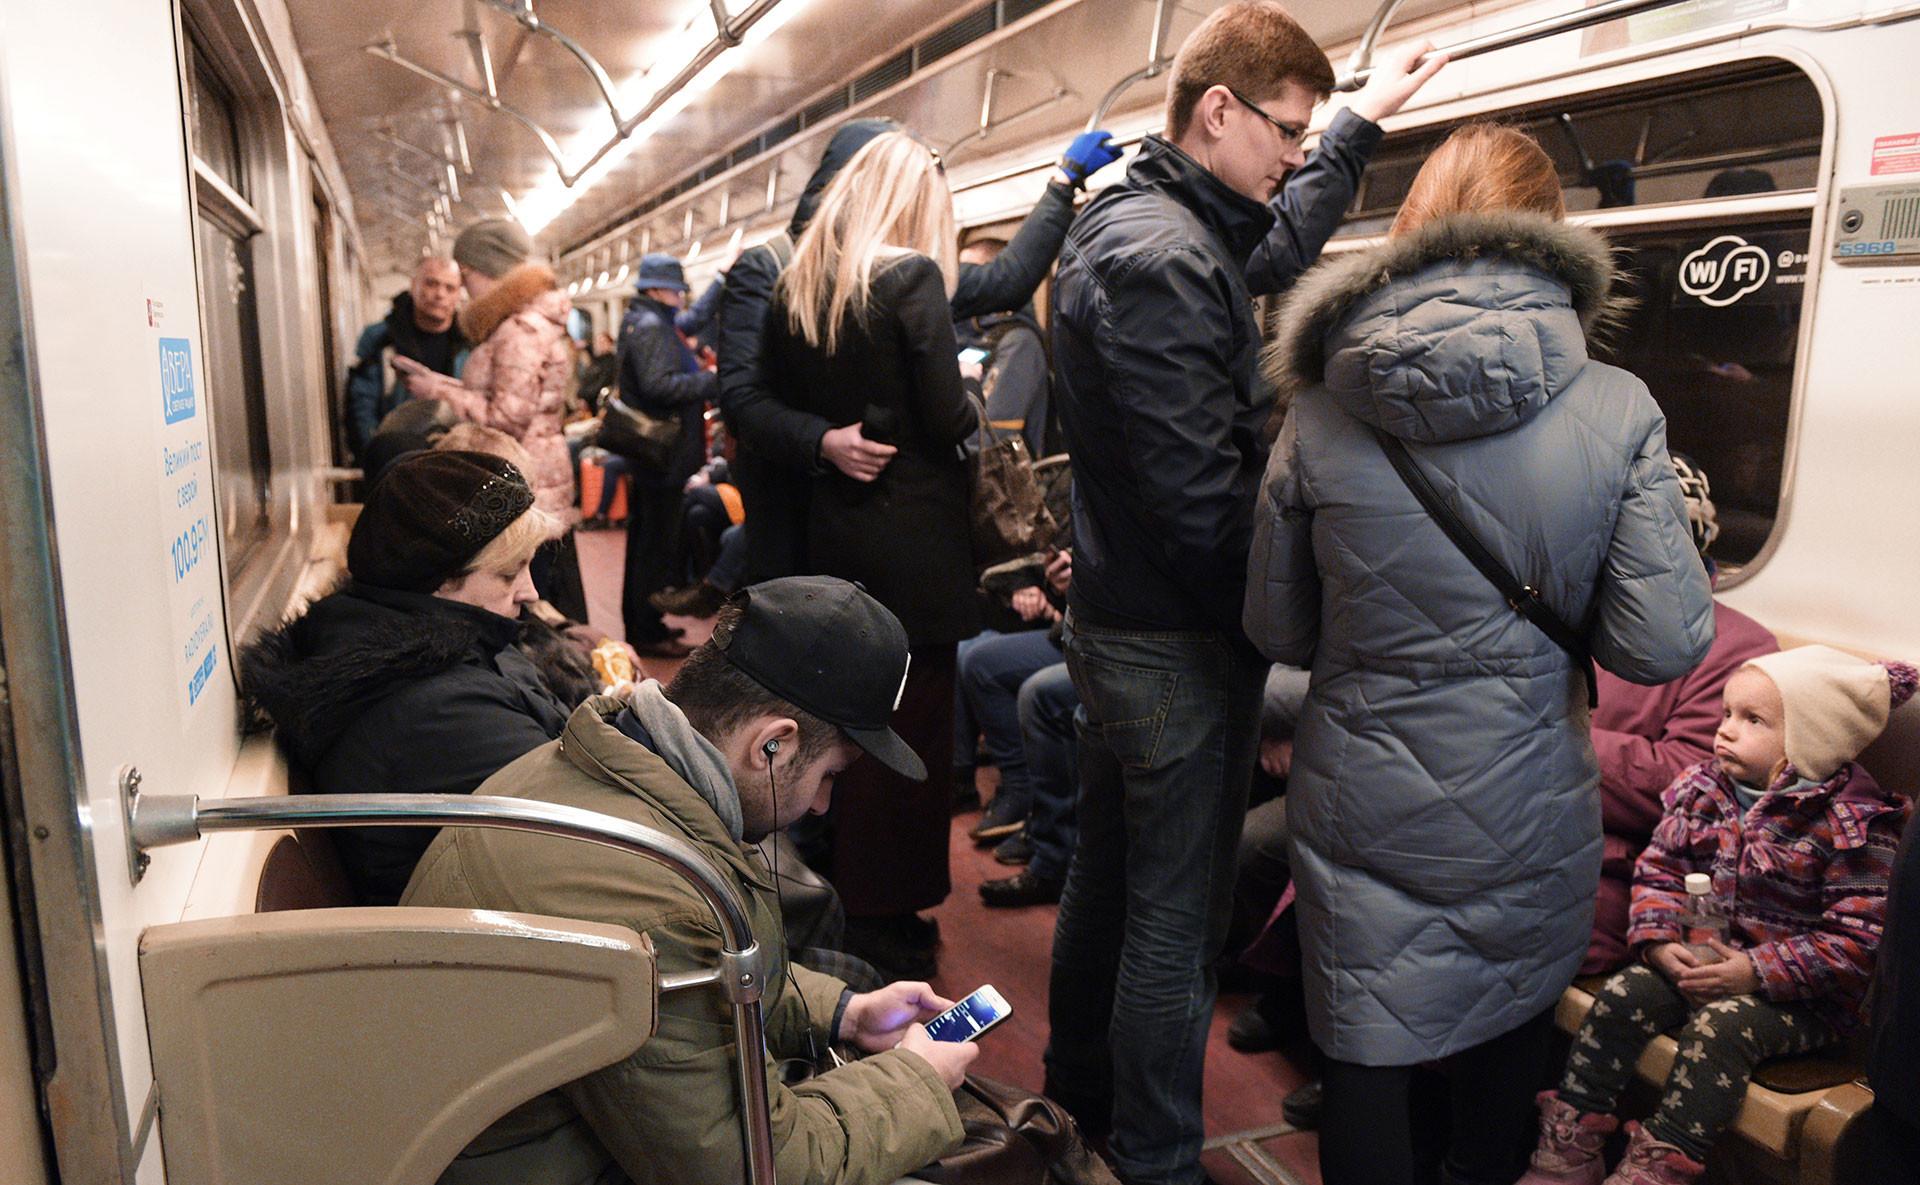 Фото ©РИА Новости/Наталья Селиверстова